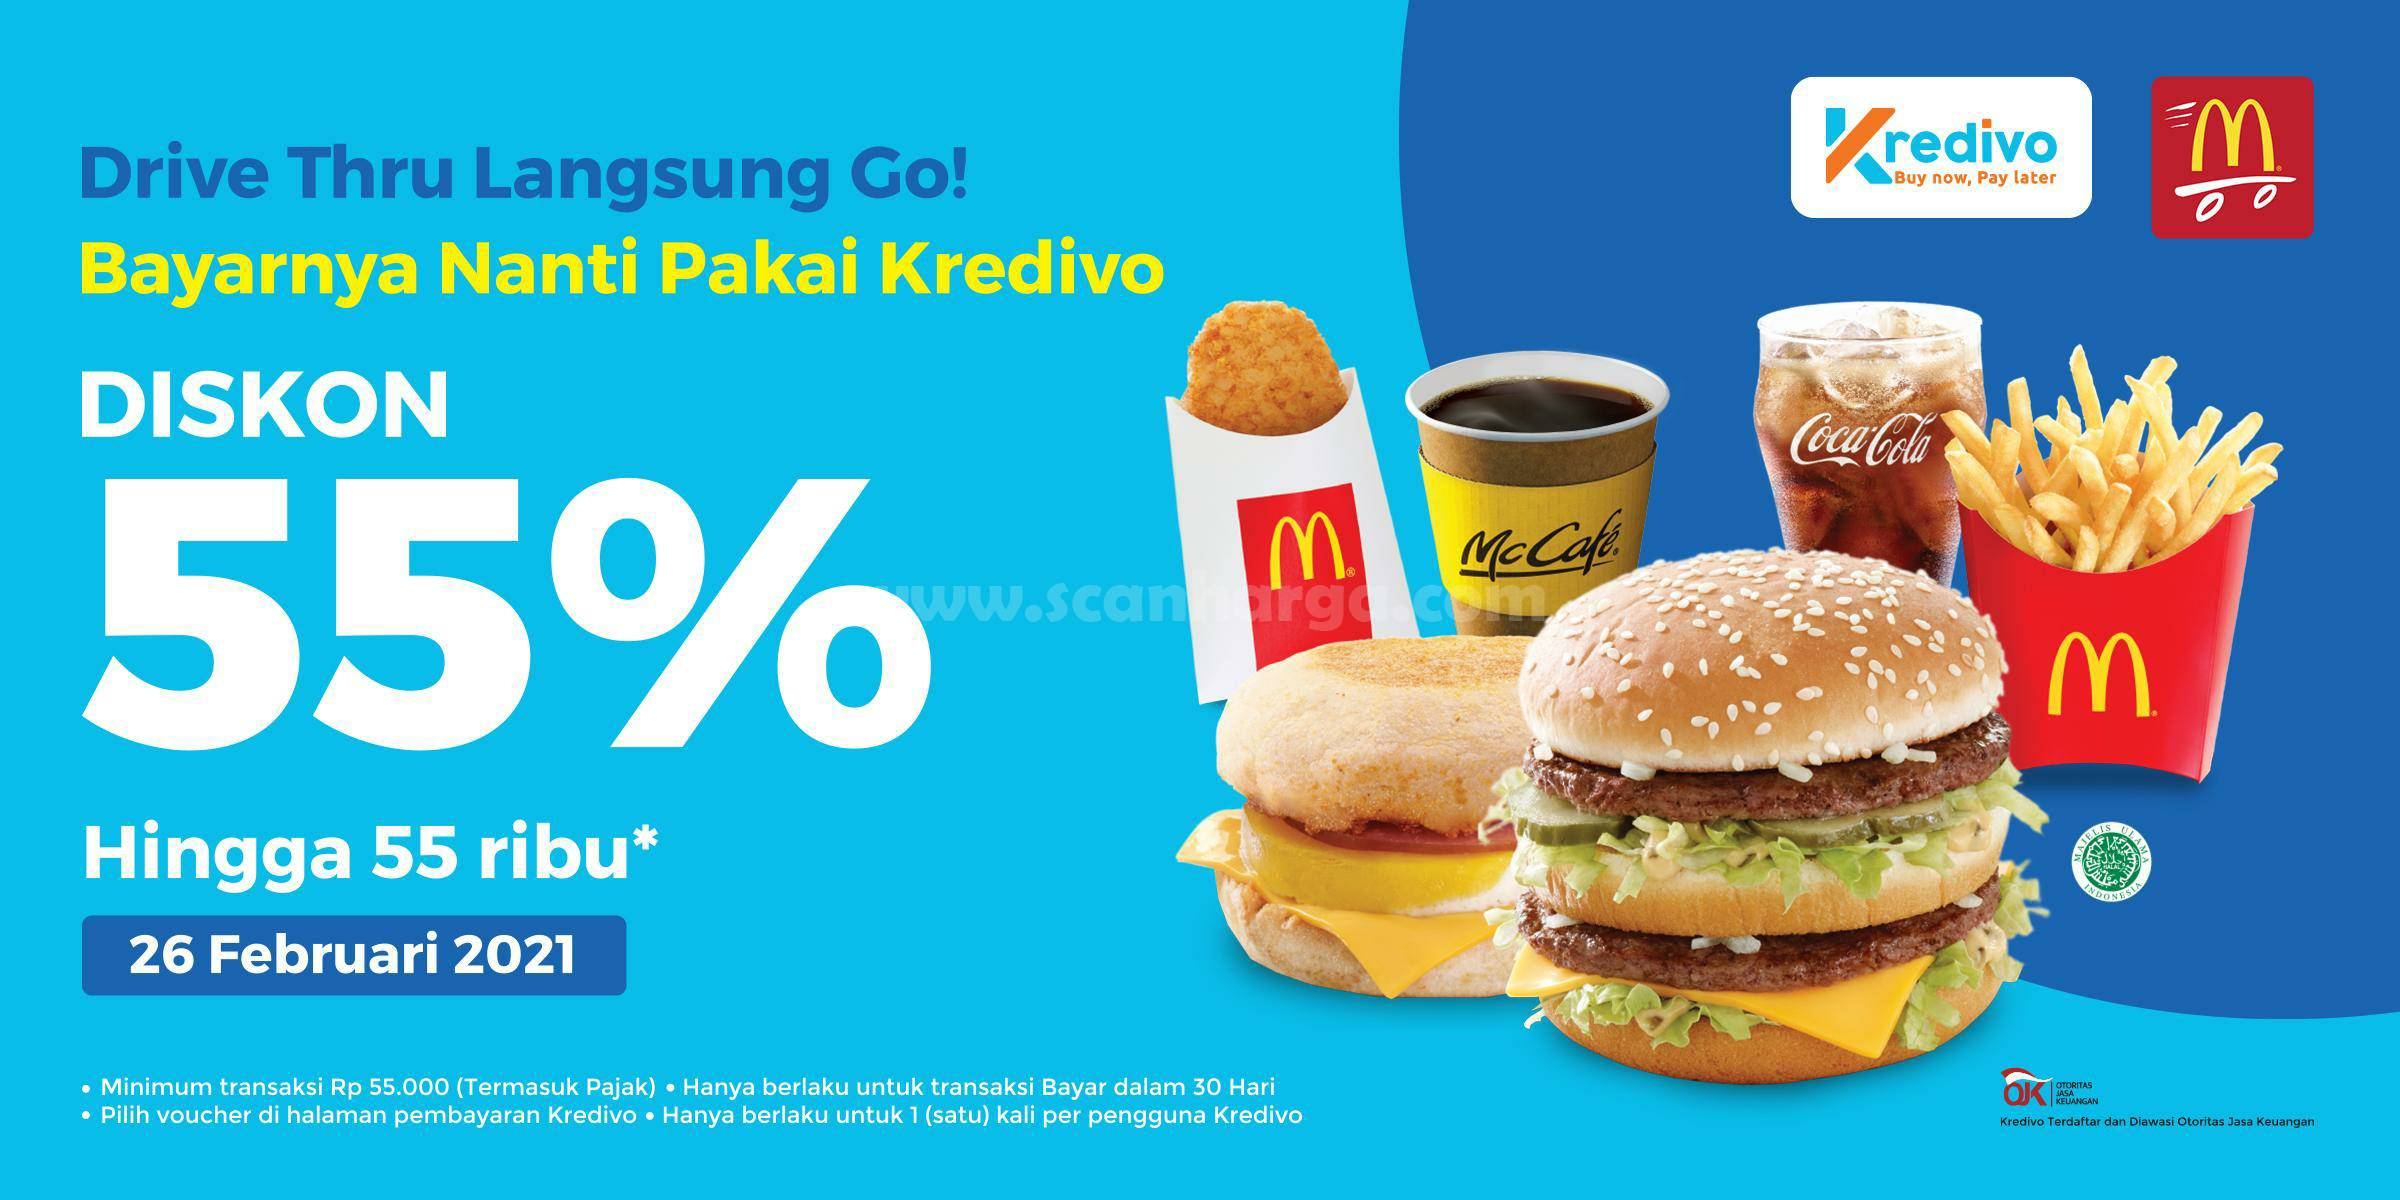 Promo McDonalds DISKON 55% dengan KREDIVO via Drive Thru